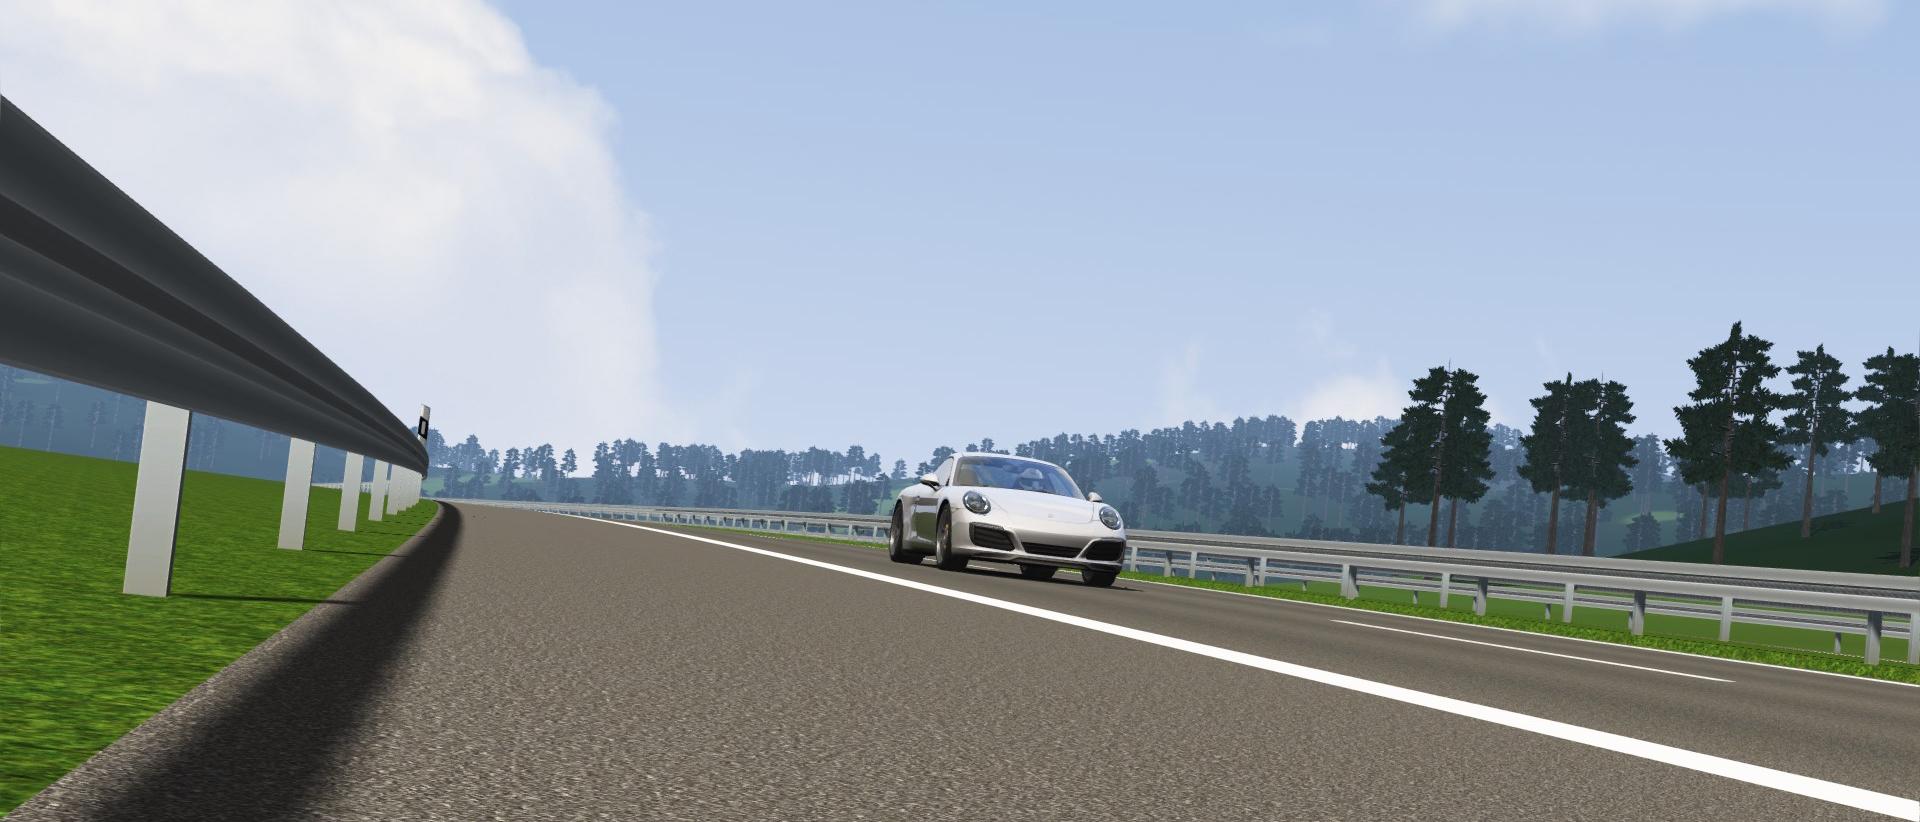 Screenshot_ks_porsche_991_carrera_s_Autobahn_3-12-116-0-4-14.jpg